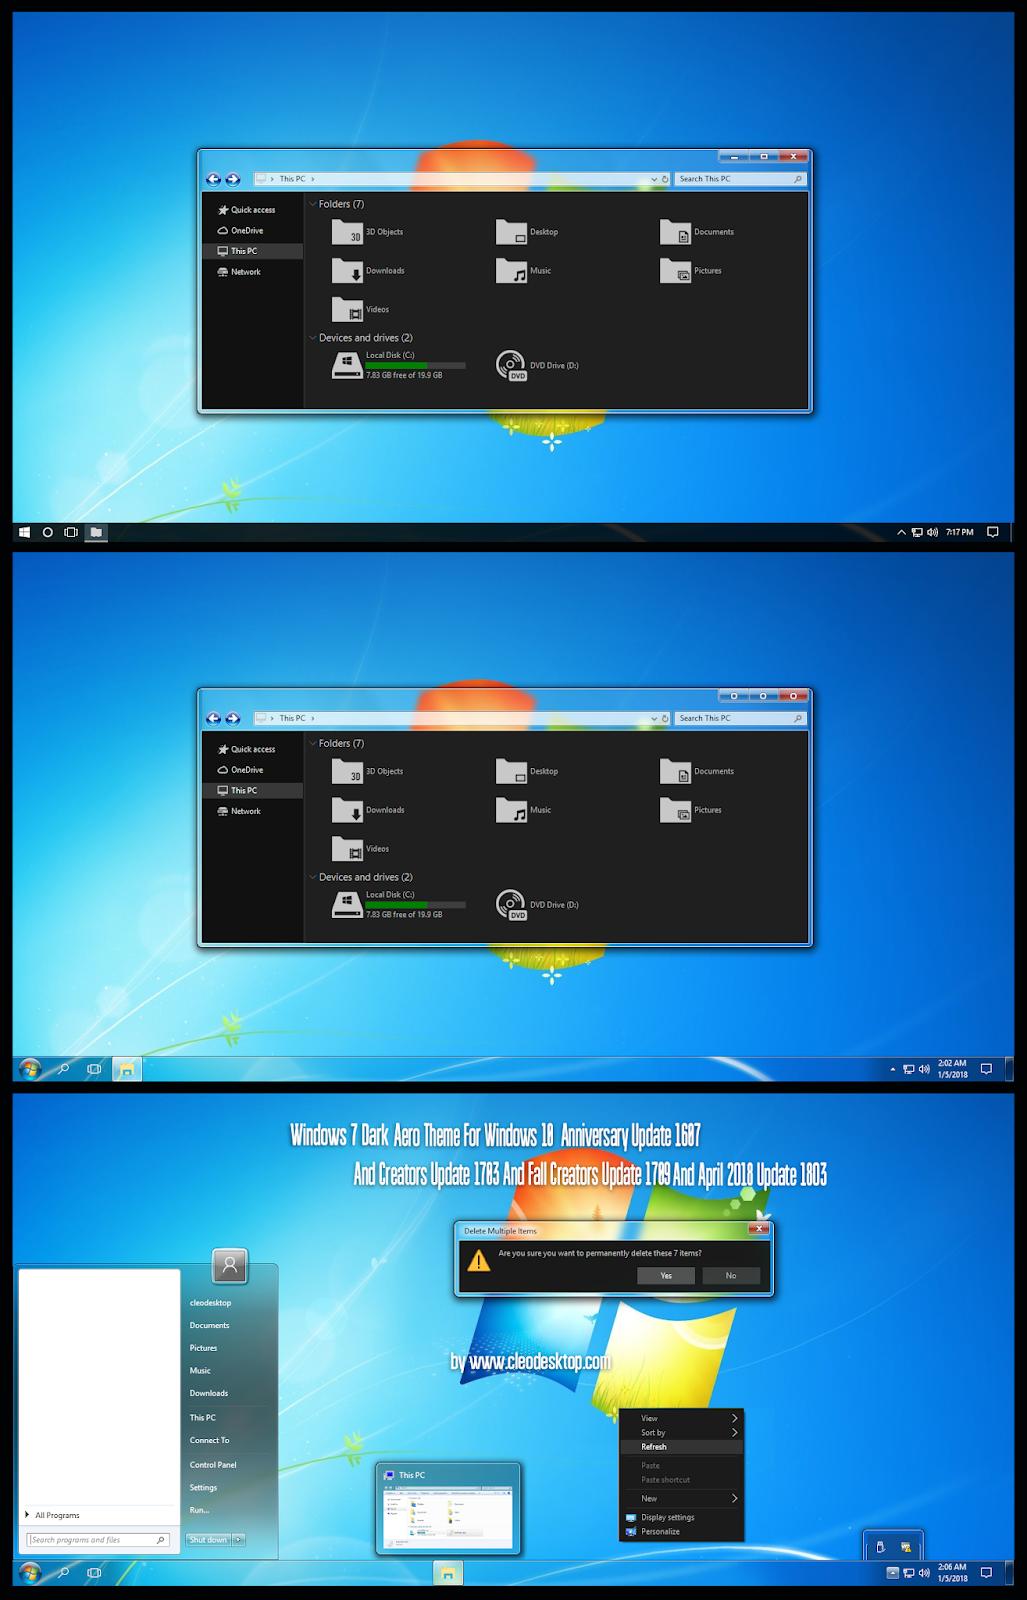 Windows 7 Dark Aero Theme Windows10 April 2018 Update 1803